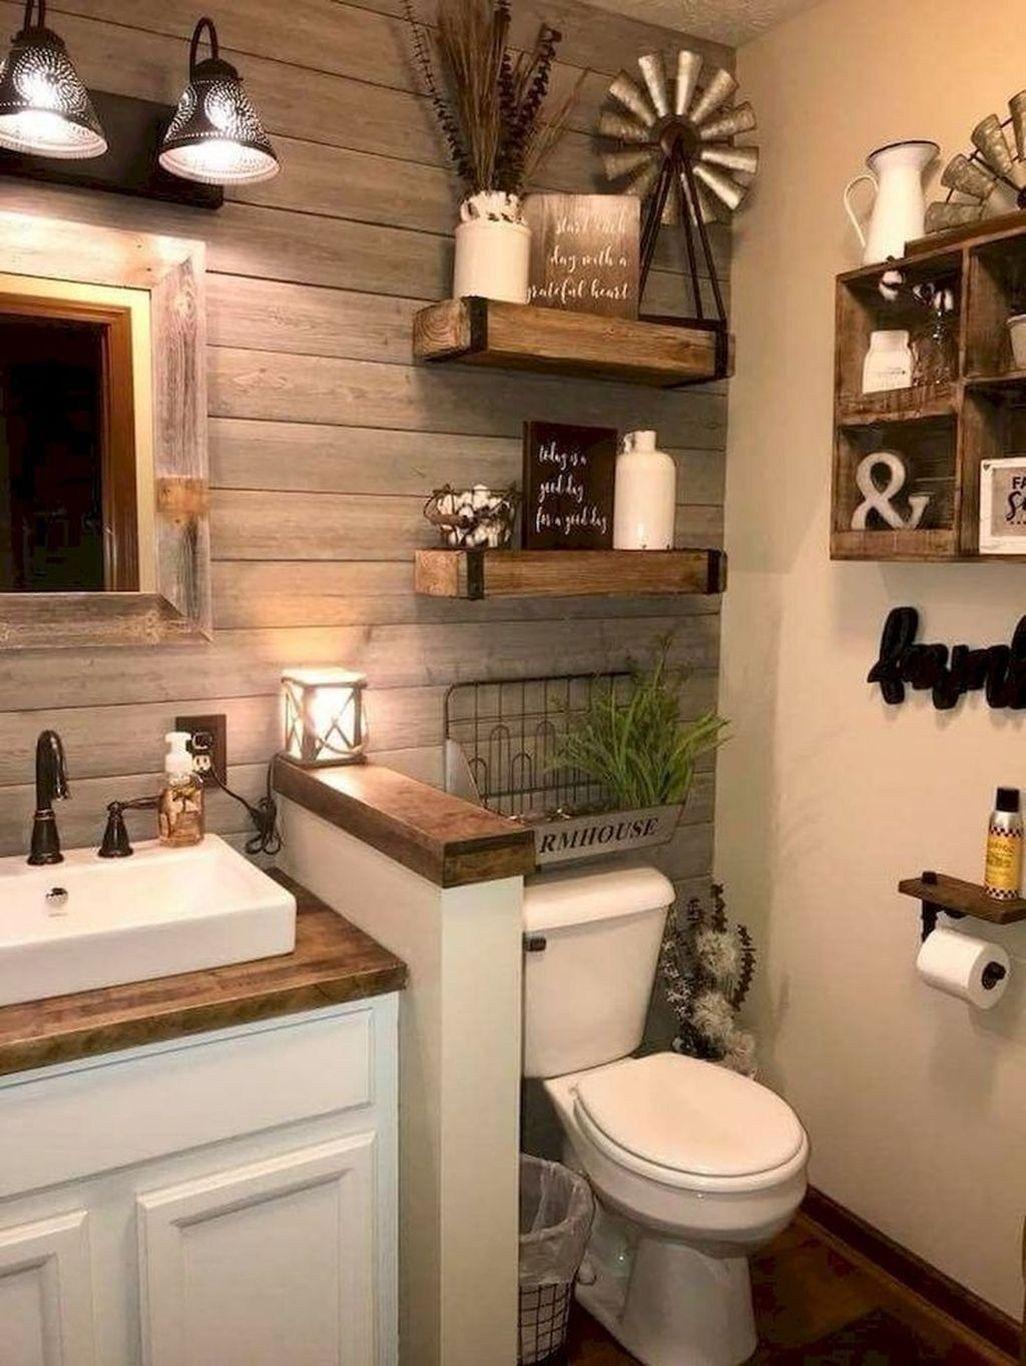 Diy Small Rustic Bathroom Ideas, Rustic Bathroom Wall Art Ideas